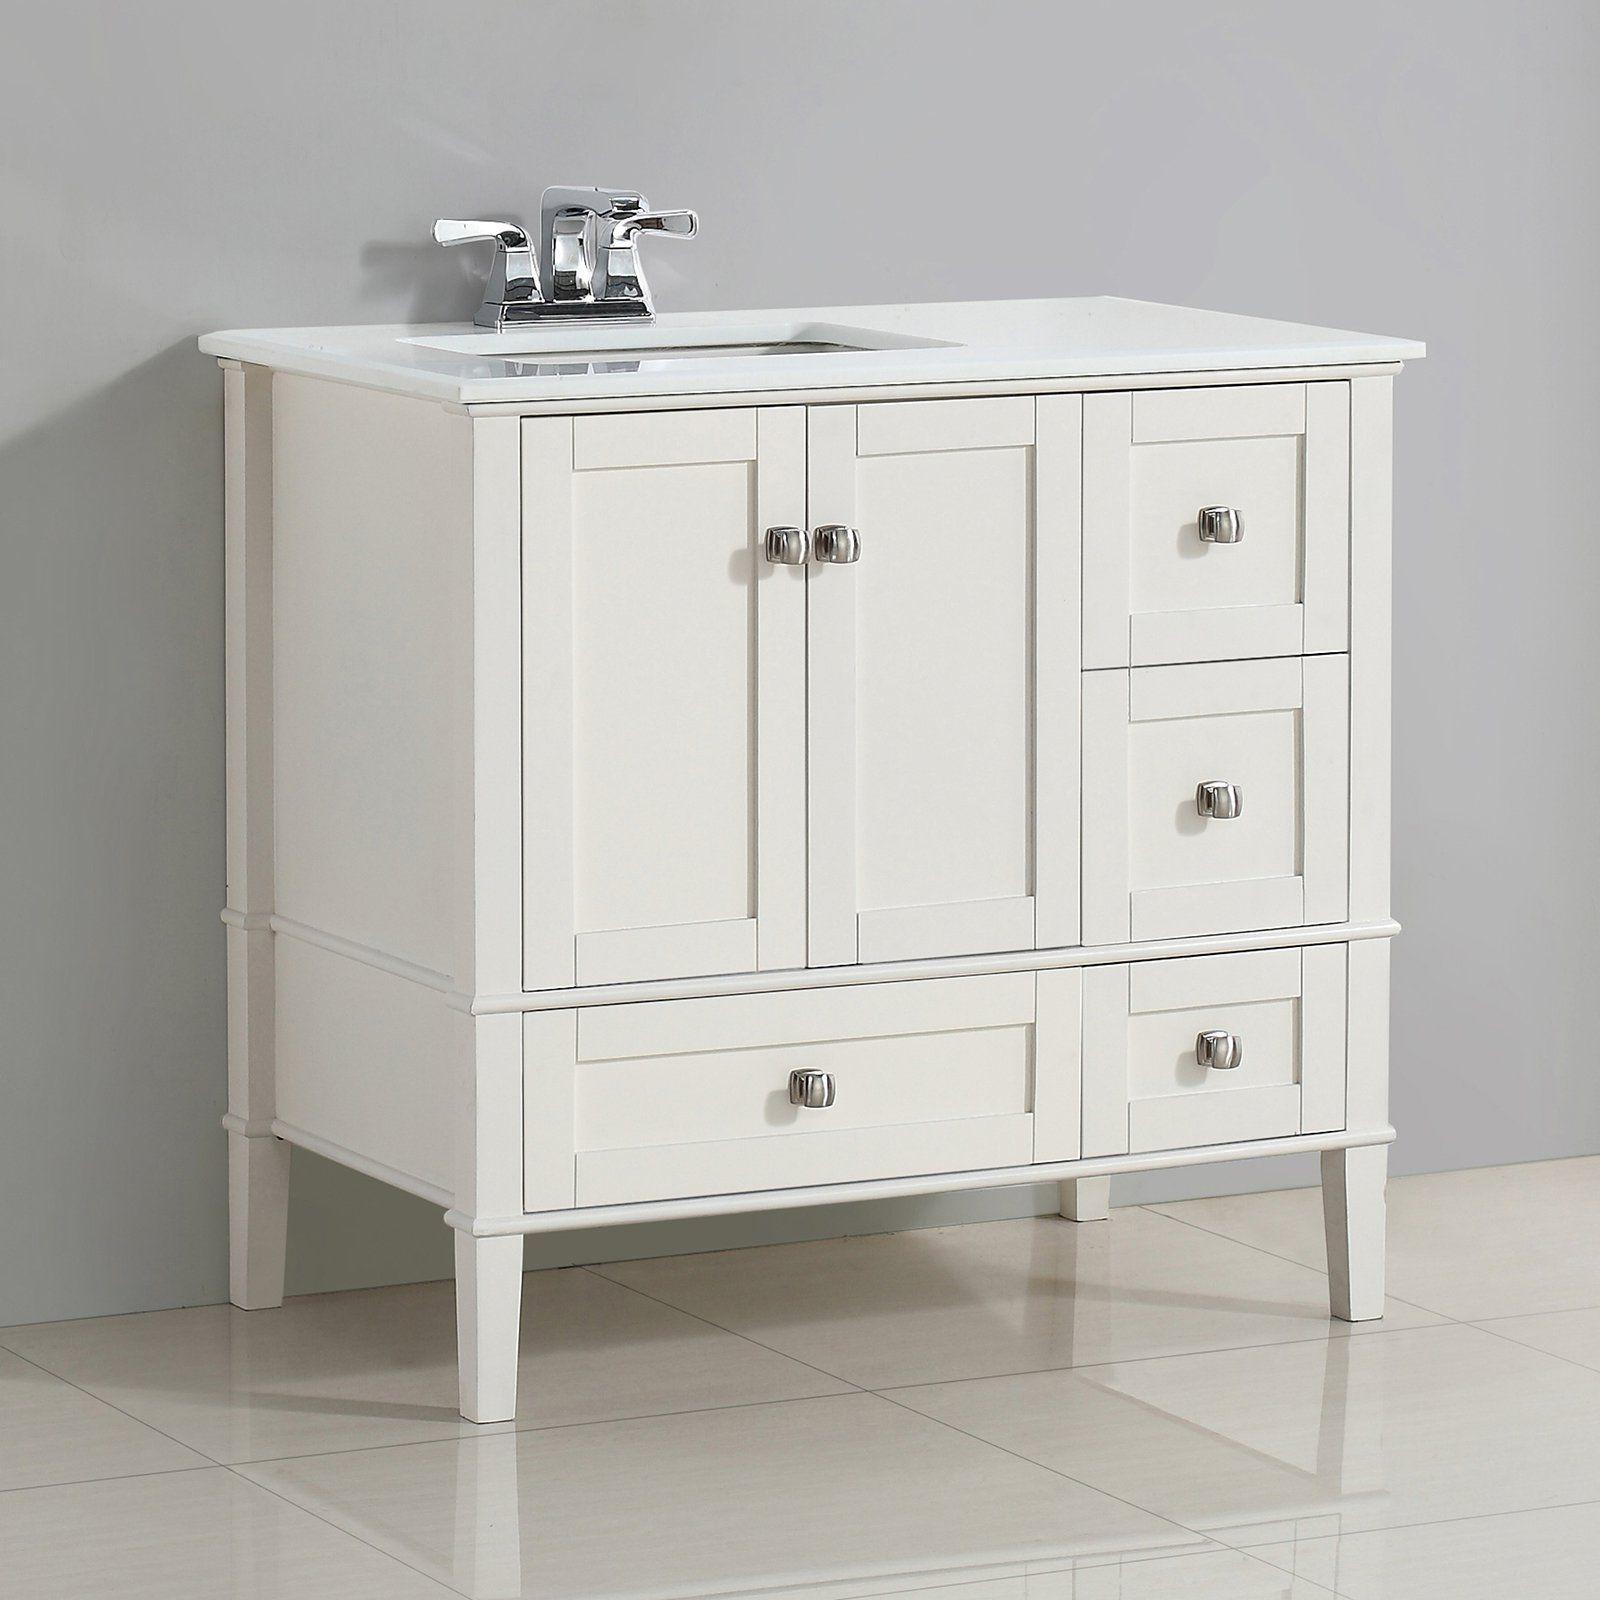 Simpli Home Nl Hhv029 36 2a Chelsea 36 In Single Bathroom Vanity